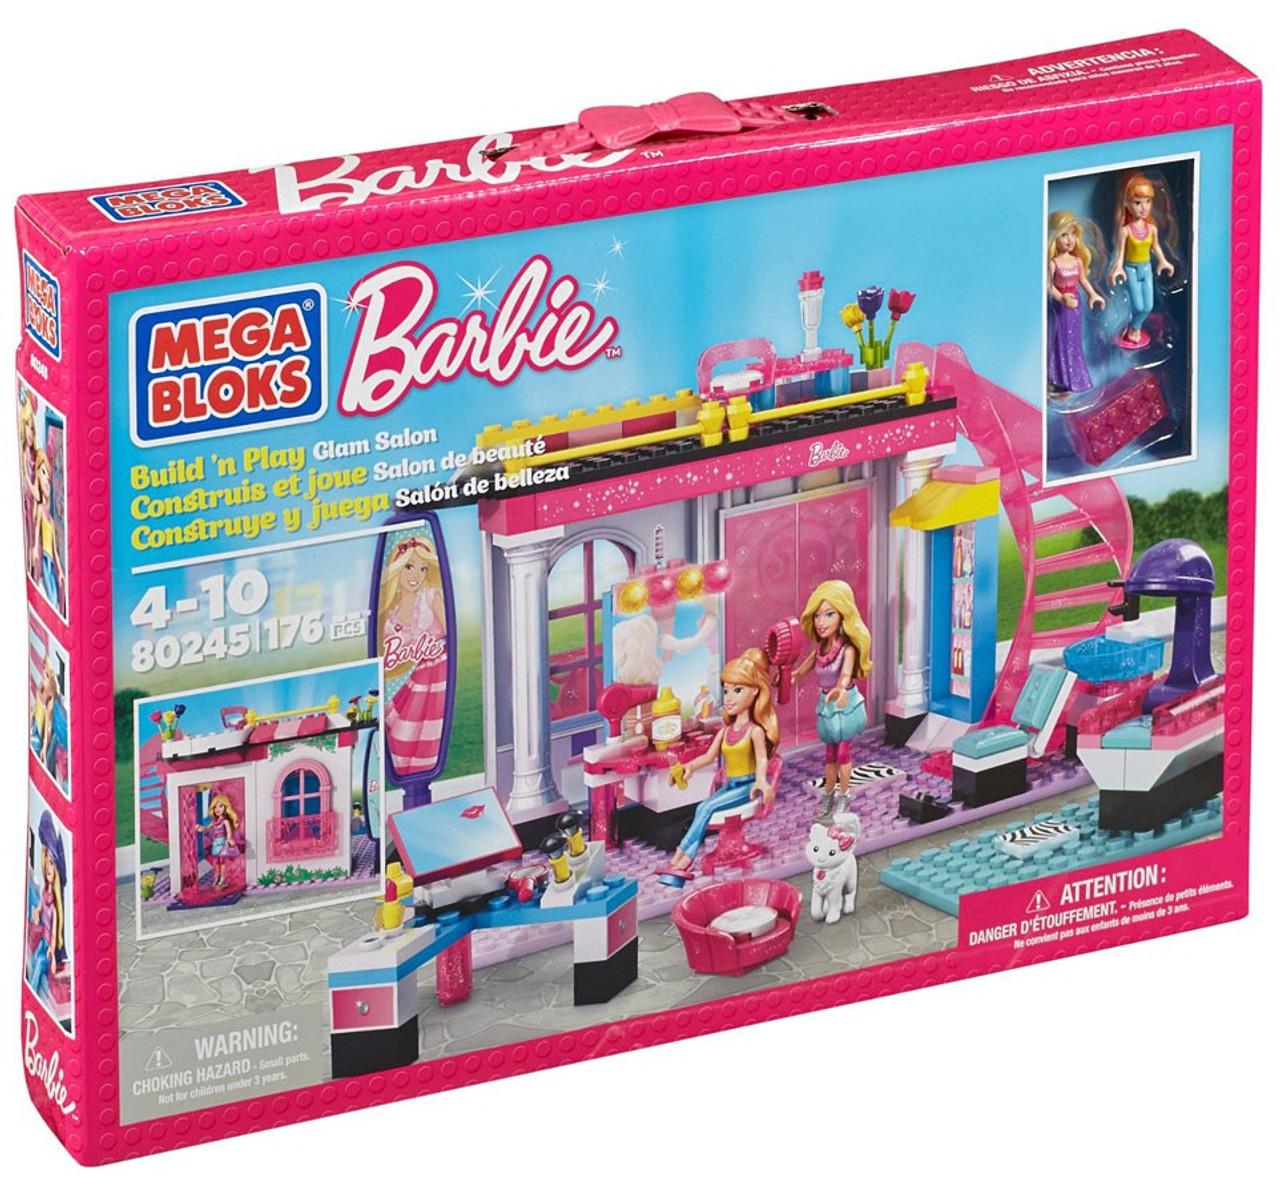 Mega Bloks Barbie Build n Play Glam Salon Set 80245 - ToyWiz